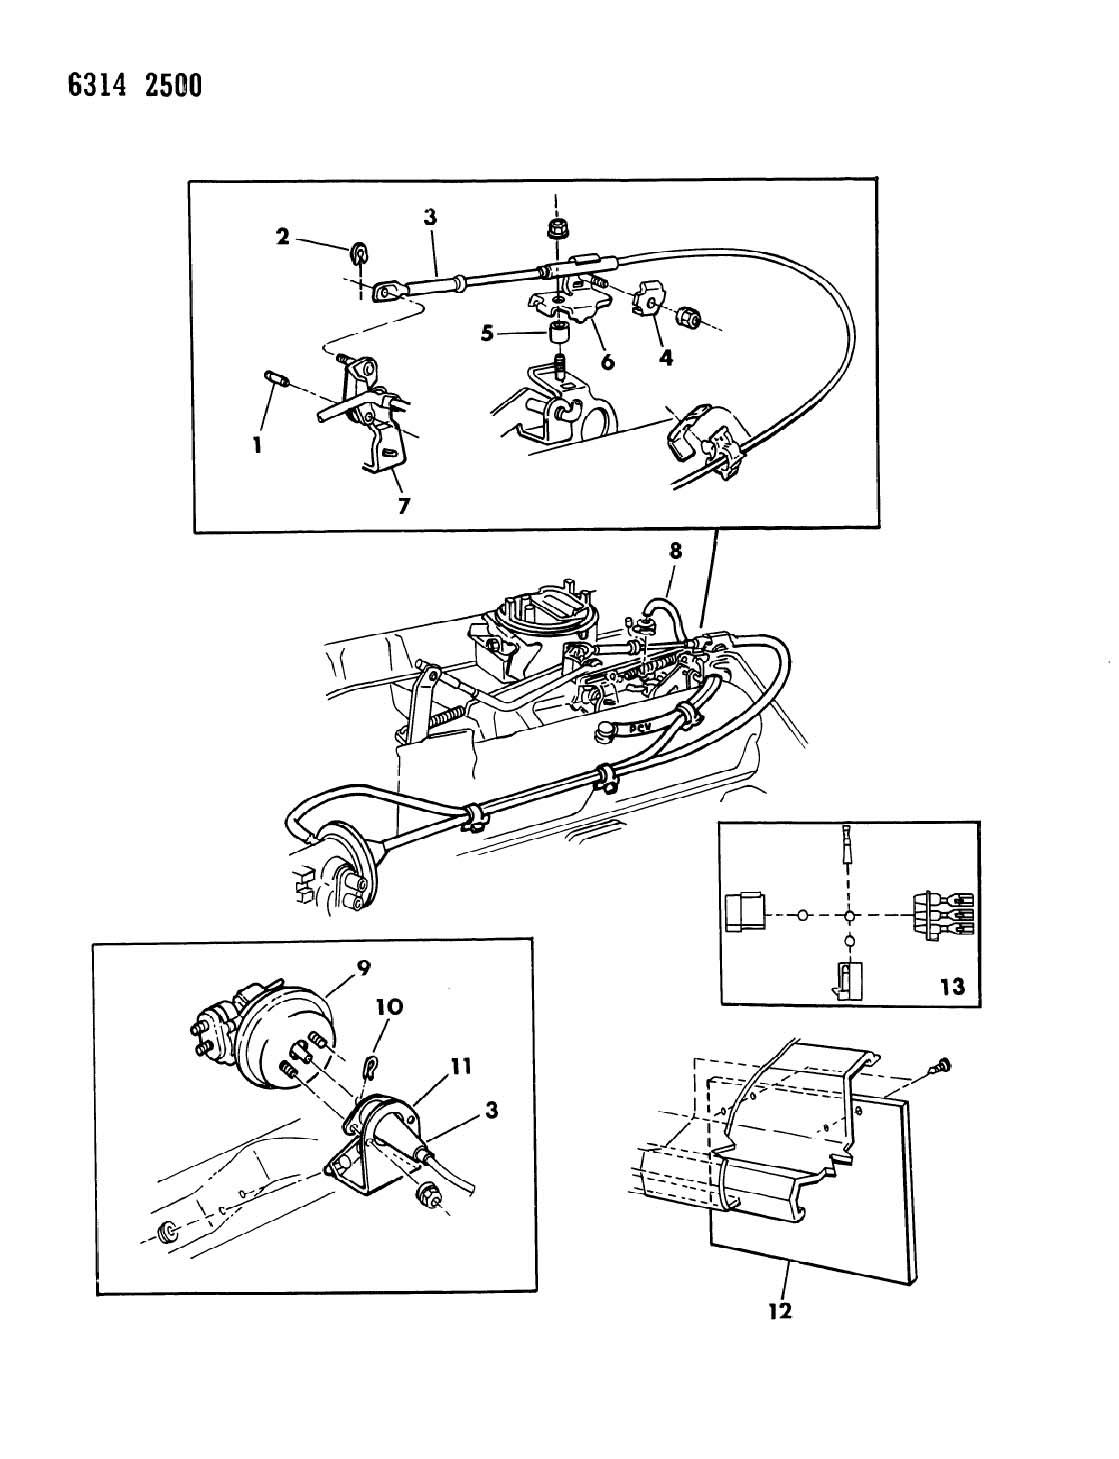 1987 dodge ram van ram wagon speed control 318 and 360